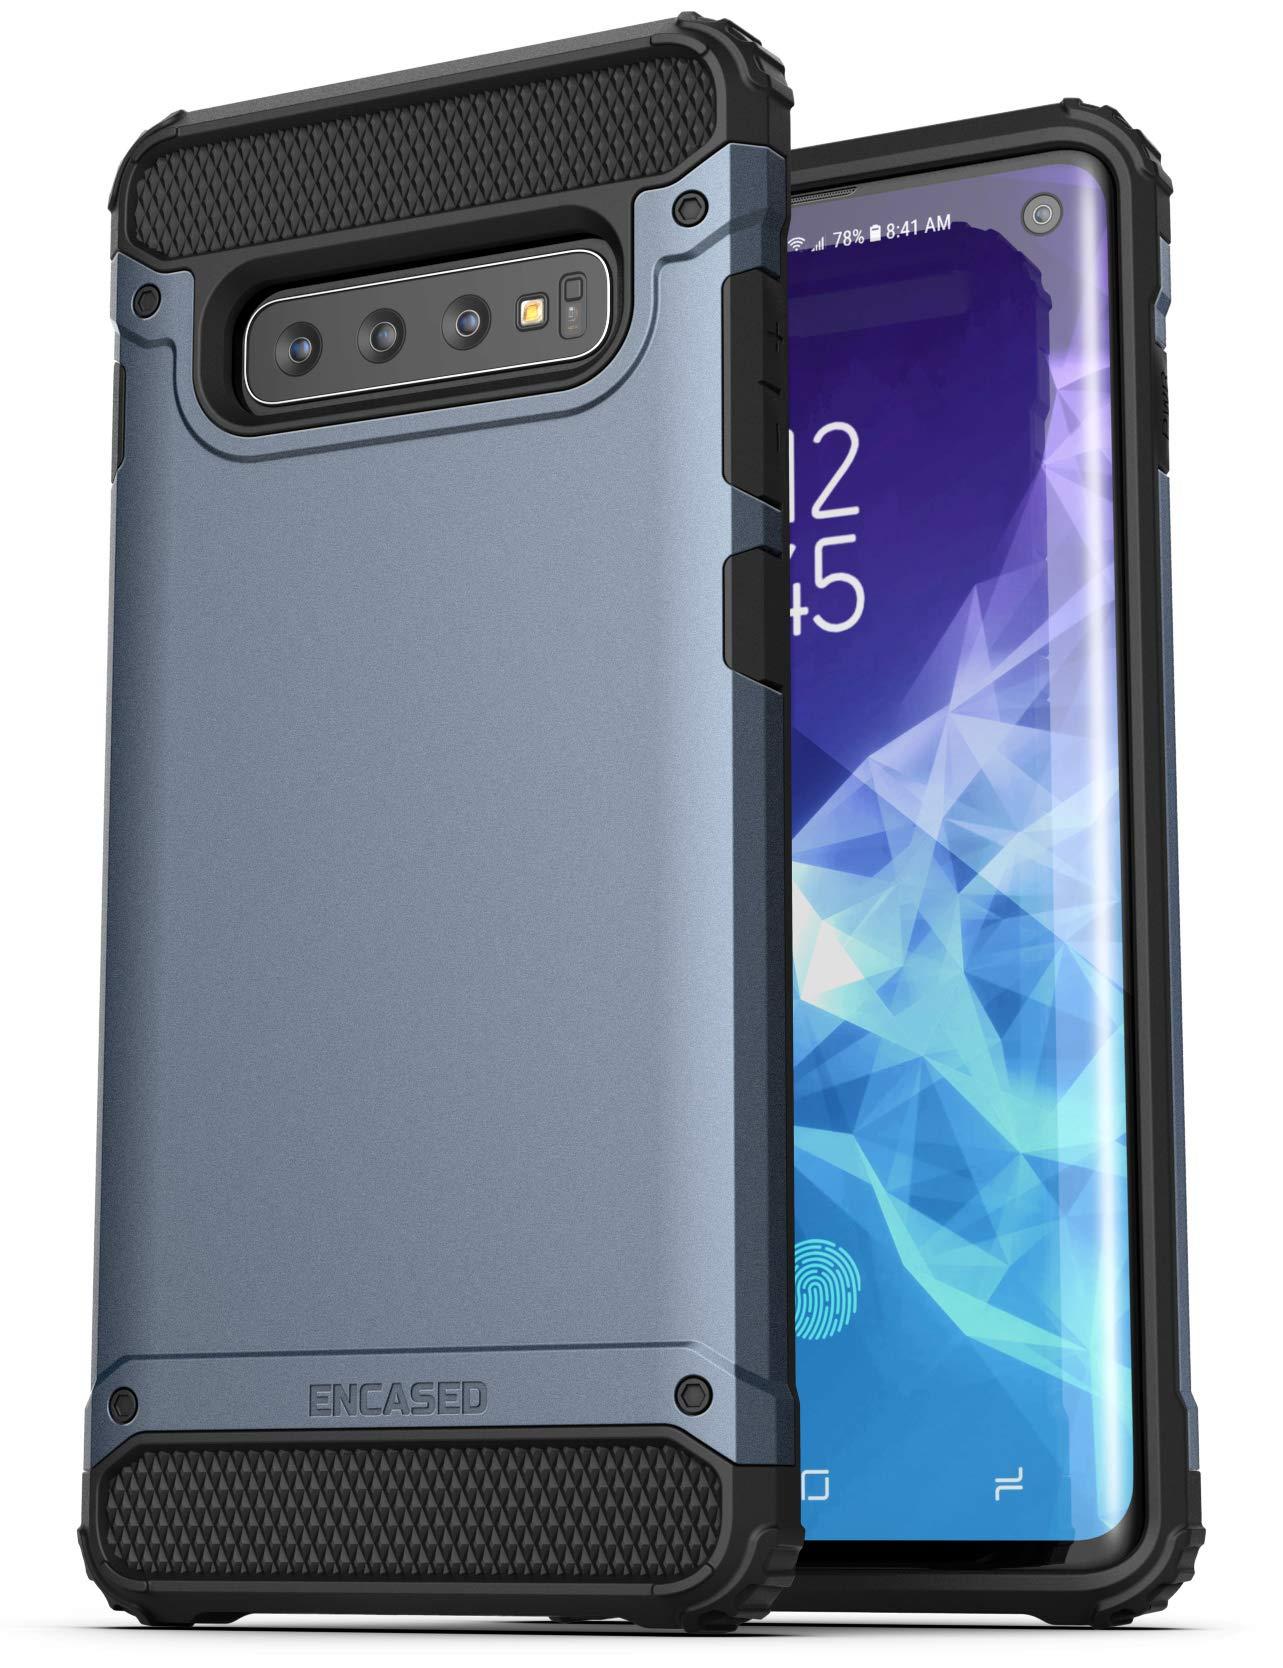 galaxy rugged phone - HD1283×1668